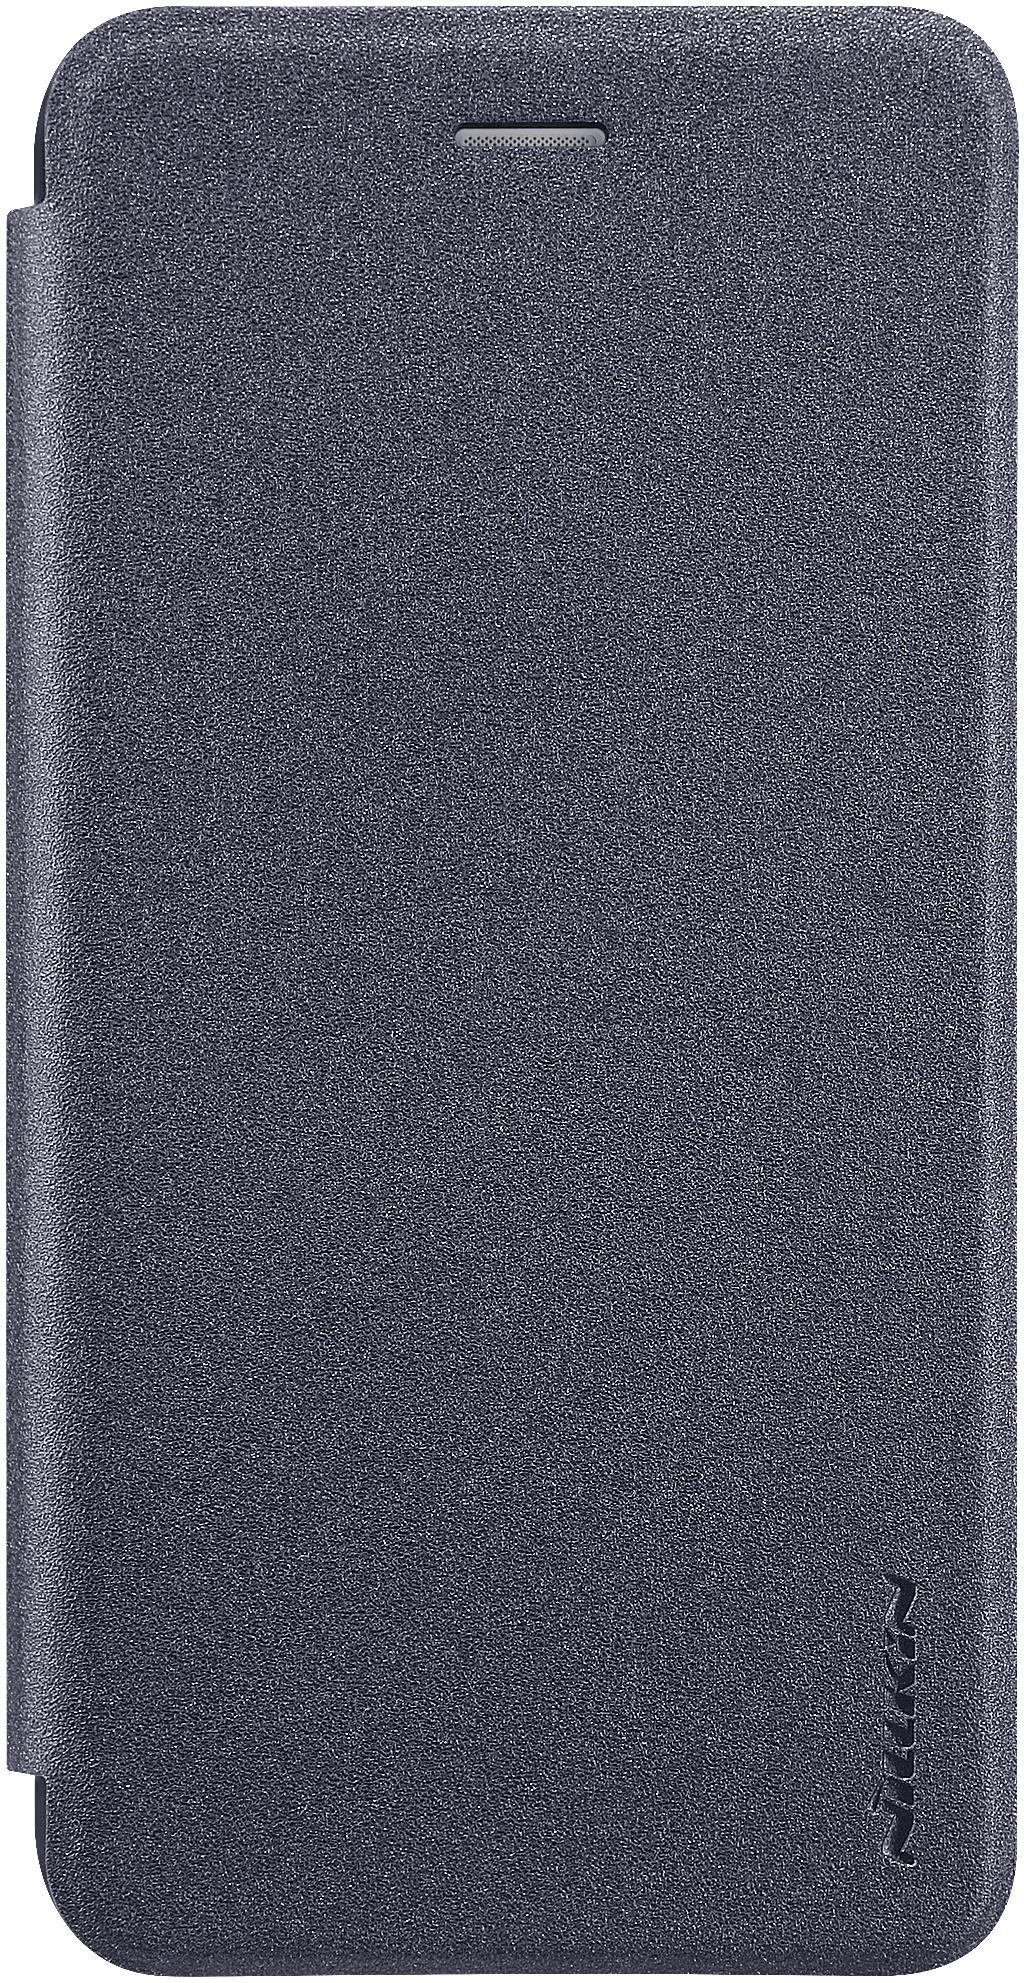 Чехол из искусственной кожи для Huawei P8 Lite (2017)/Honor 8 Lite painted pink flamingo pu leather case cover for huawei p8 lite